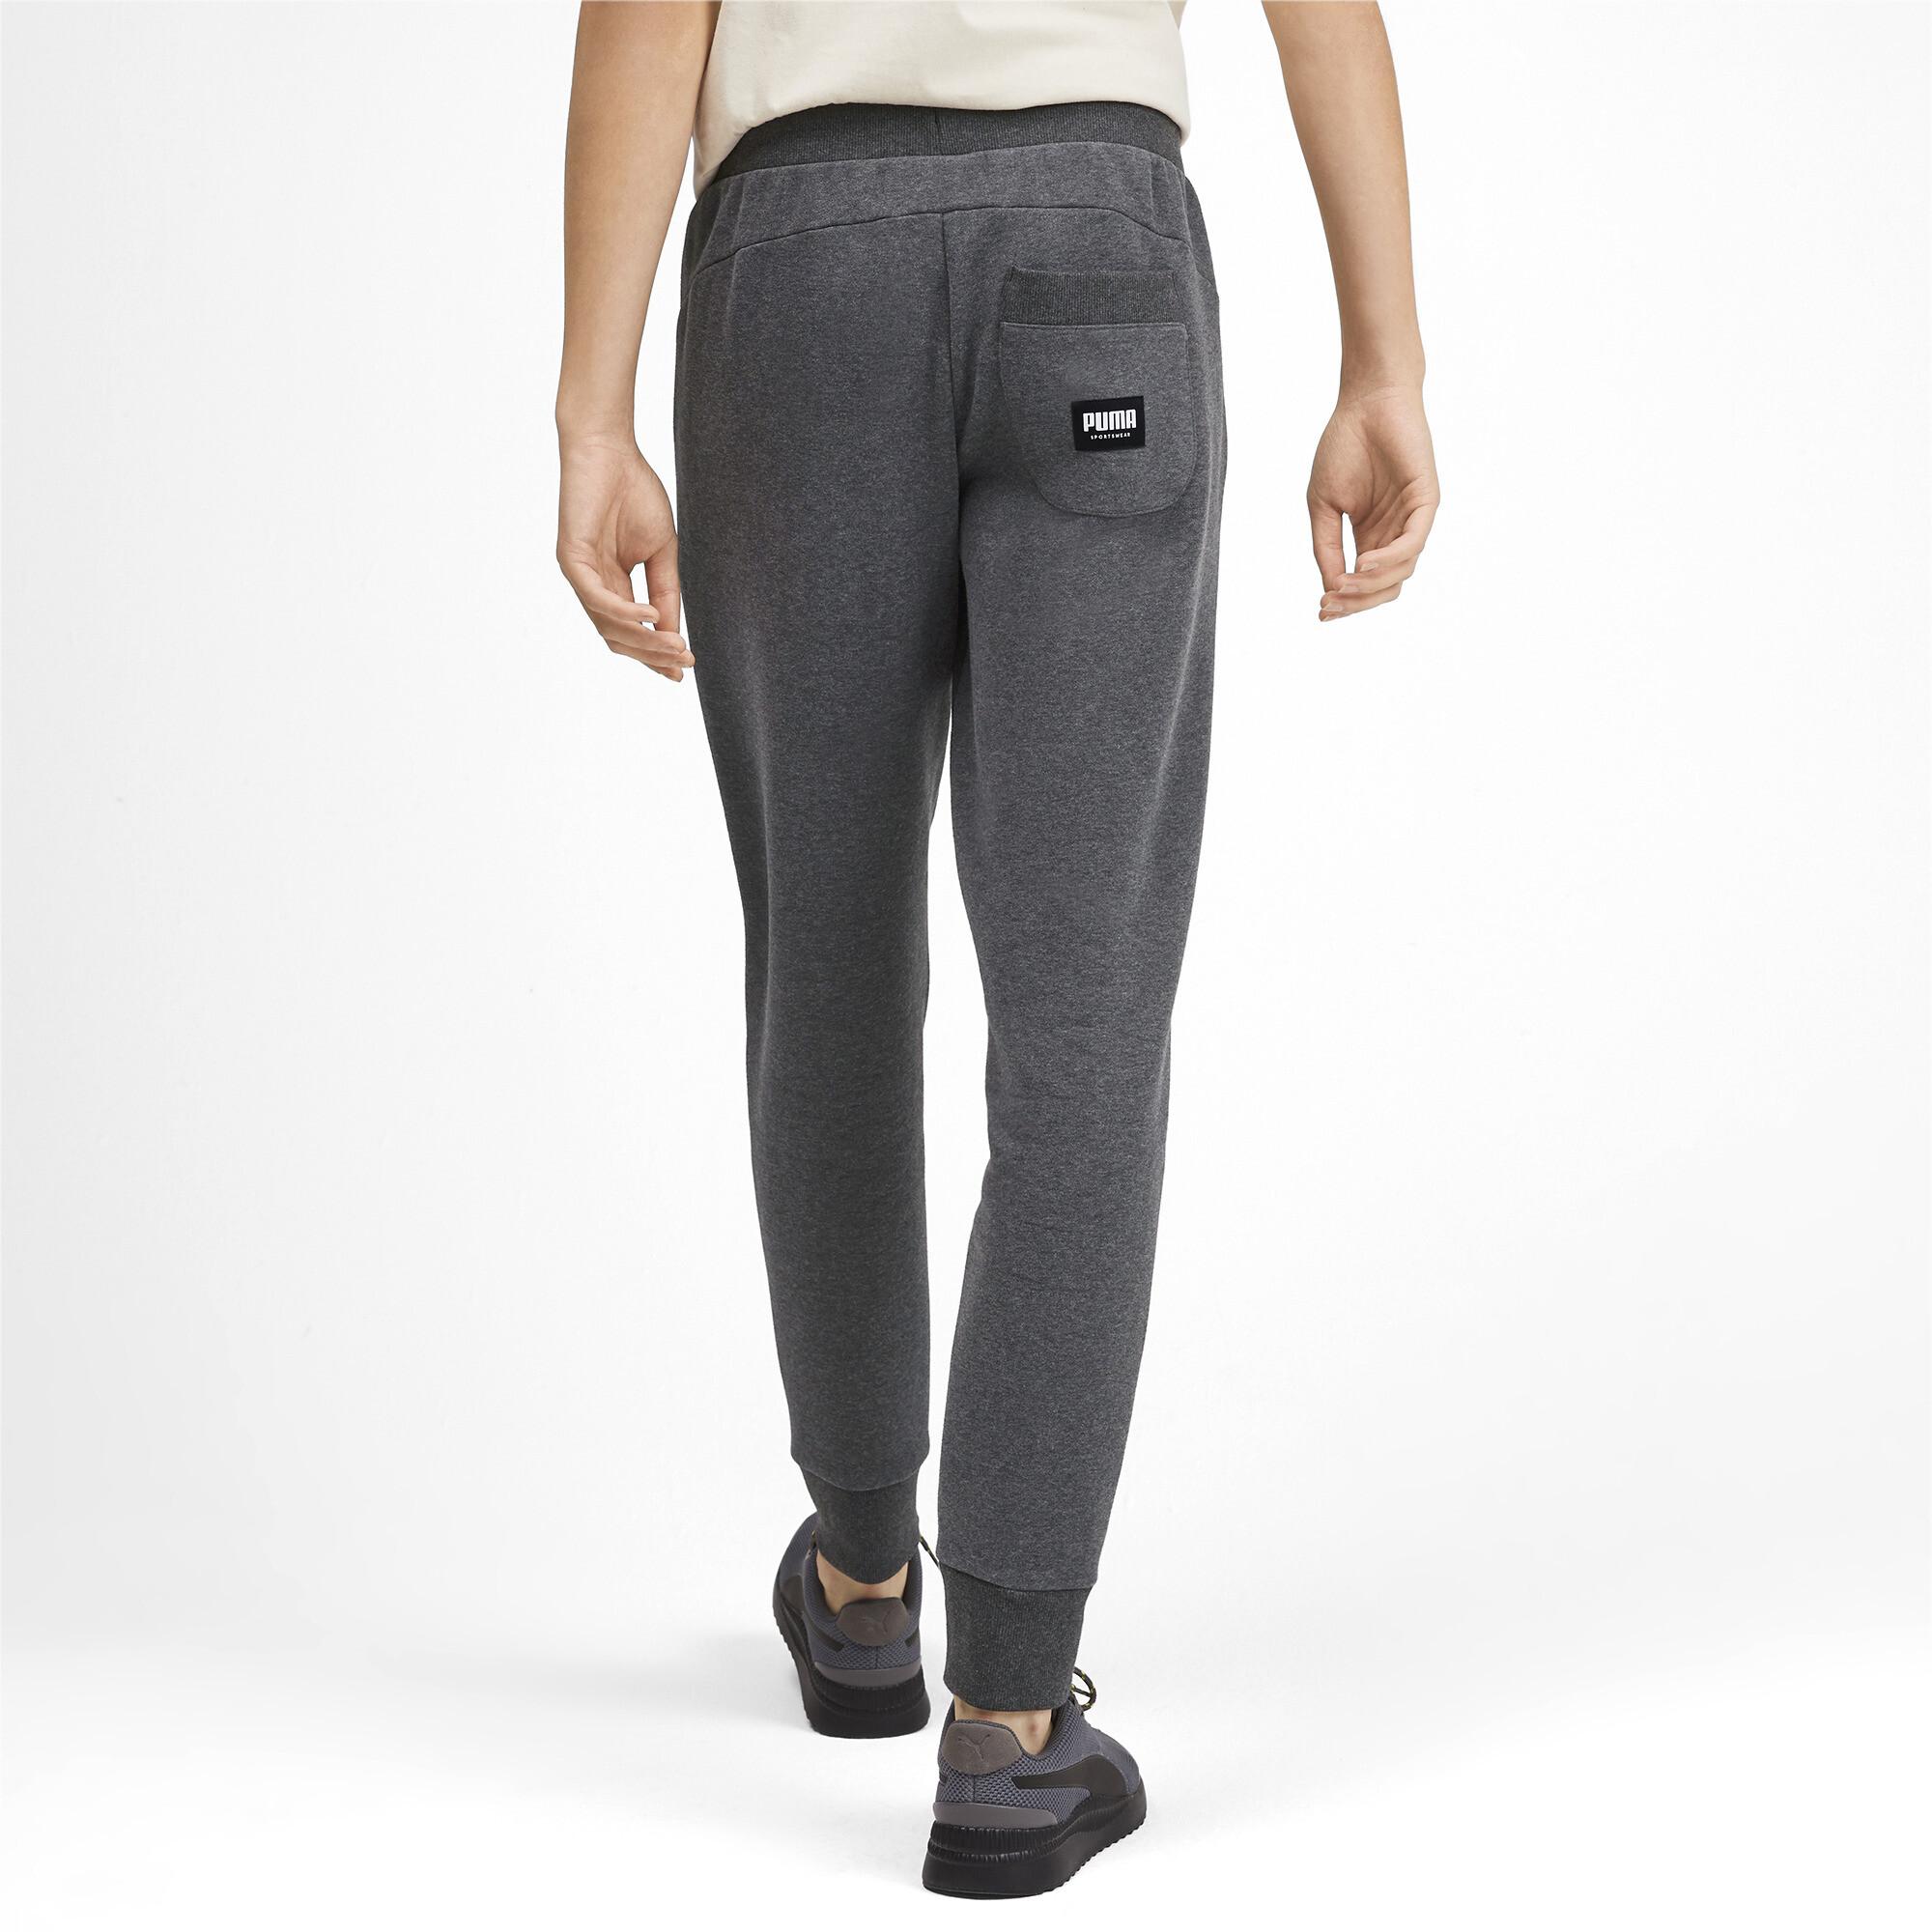 PUMA-Athletics-Men-039-s-Fleece-Pants-Men-Knitted-Pants-Basics thumbnail 5